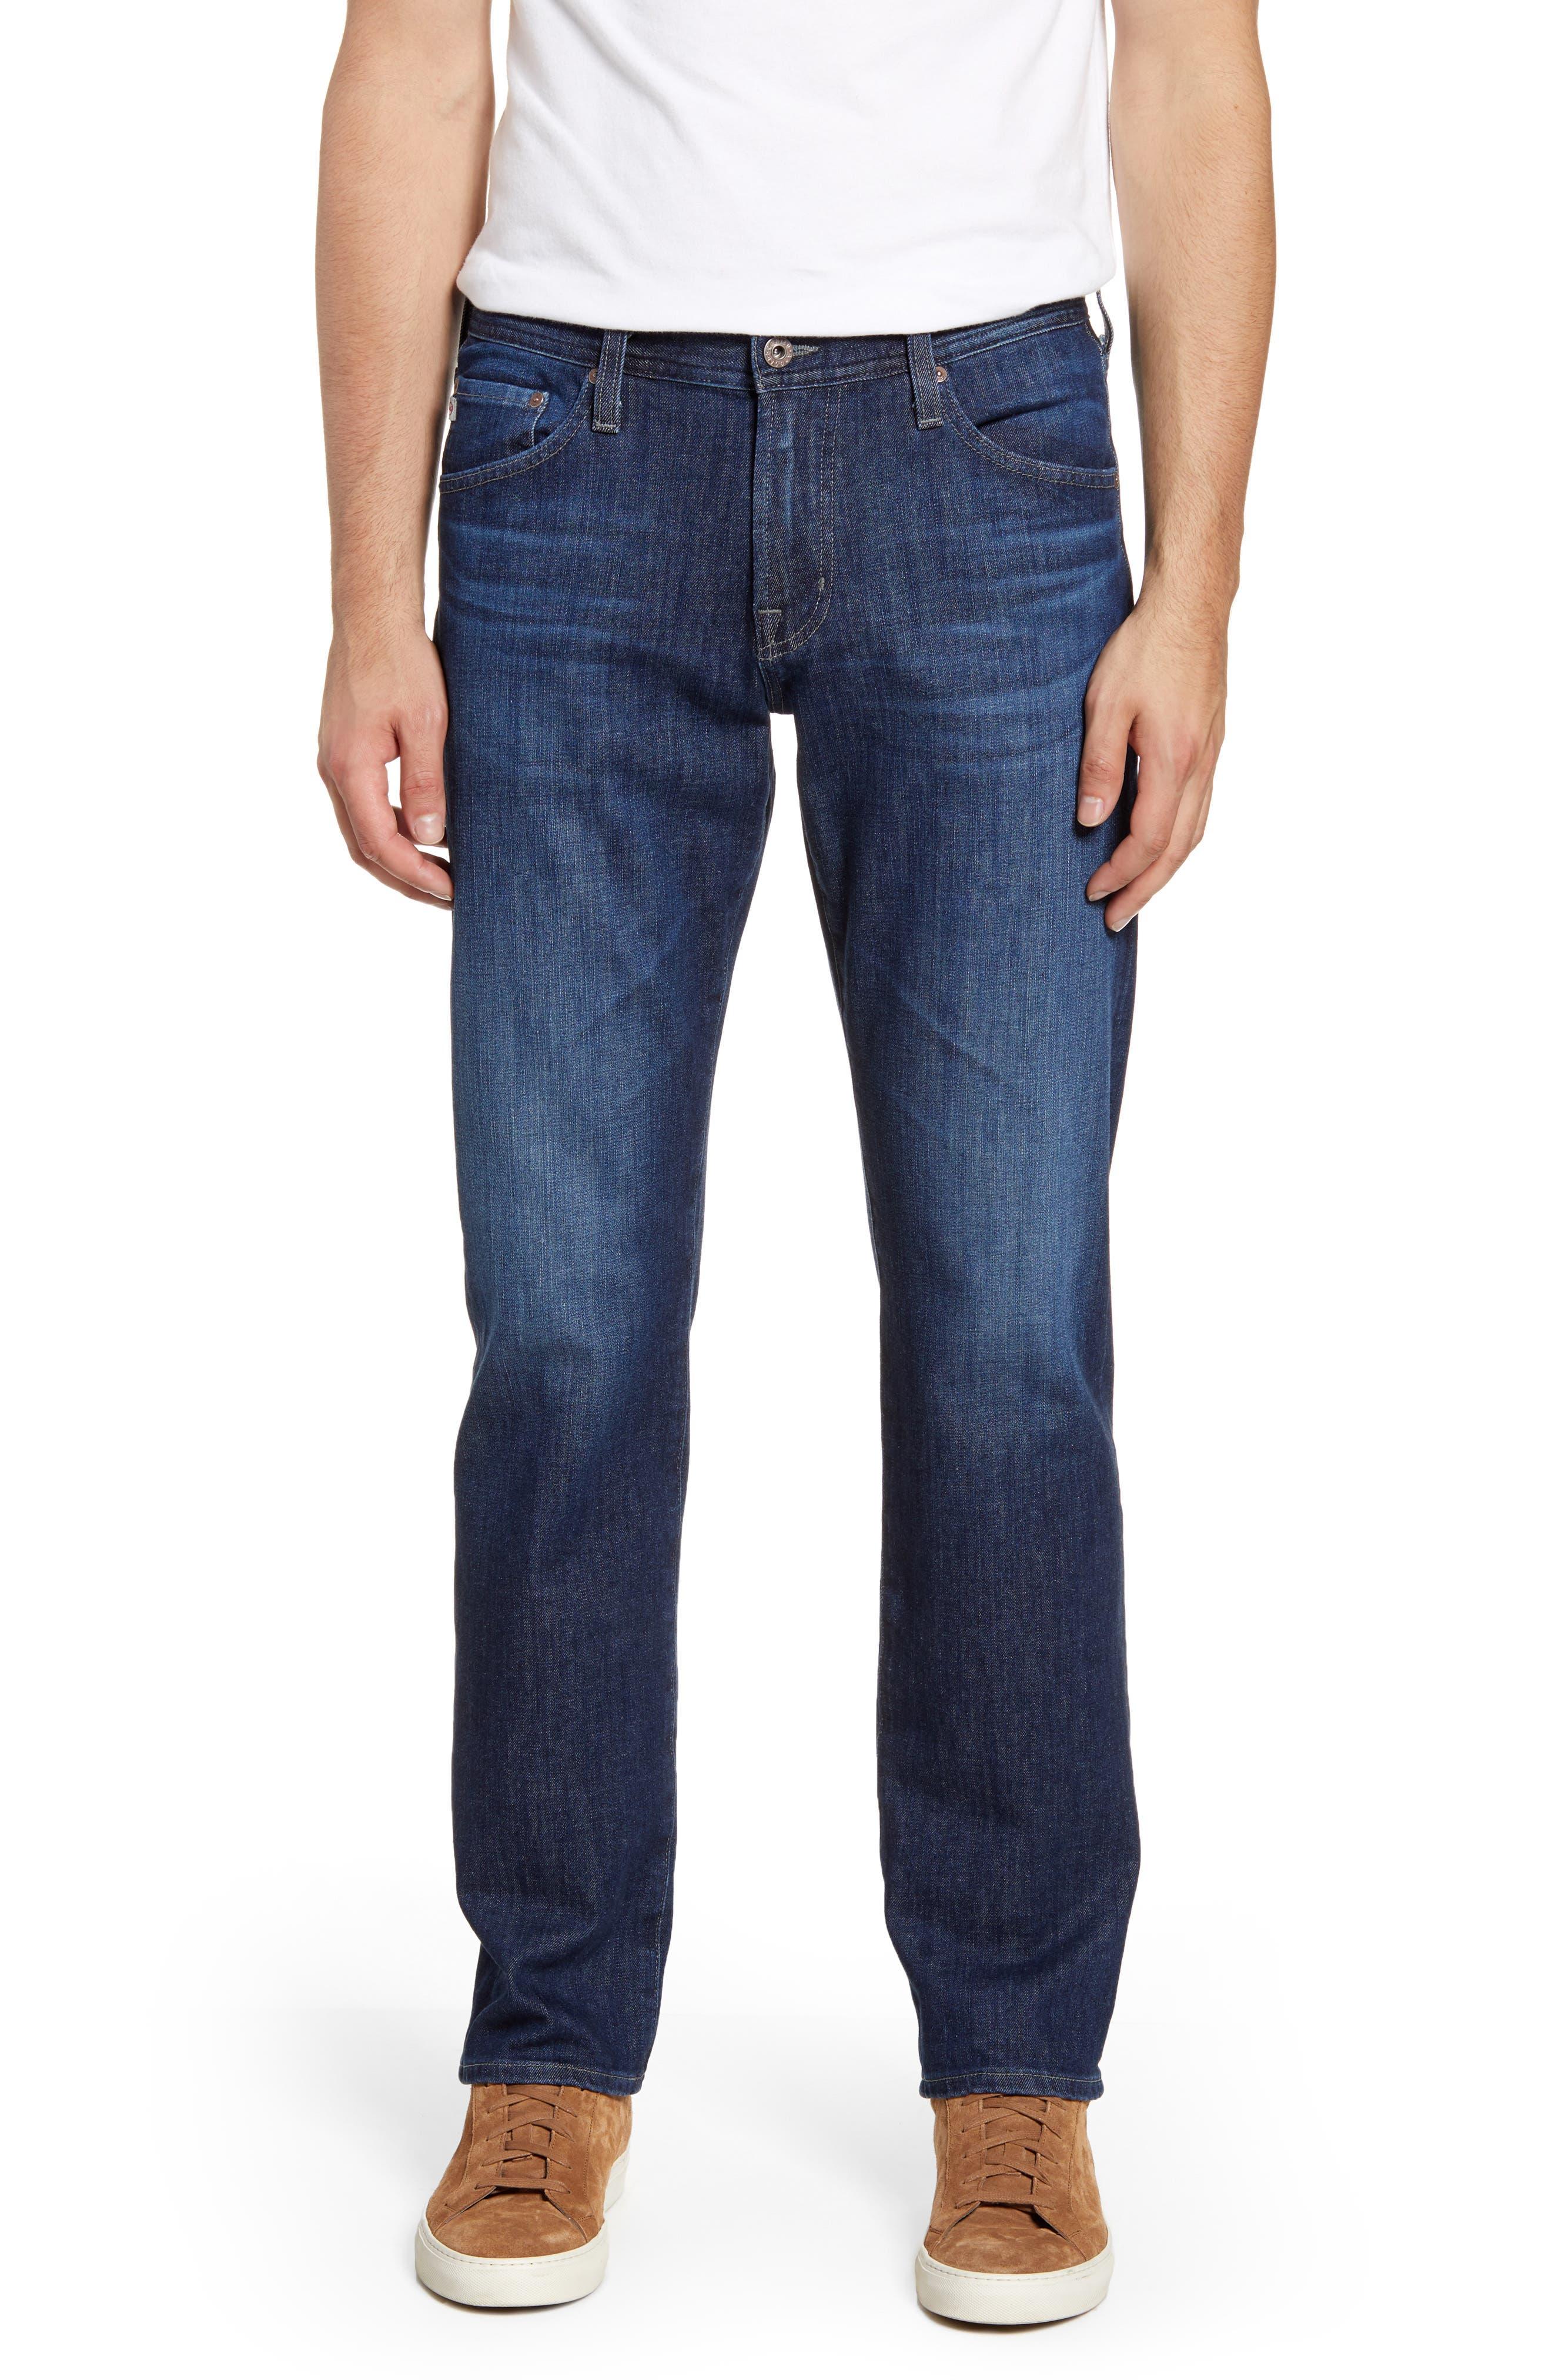 Raw Indigo Ltd Jeans Bootcut Uomo